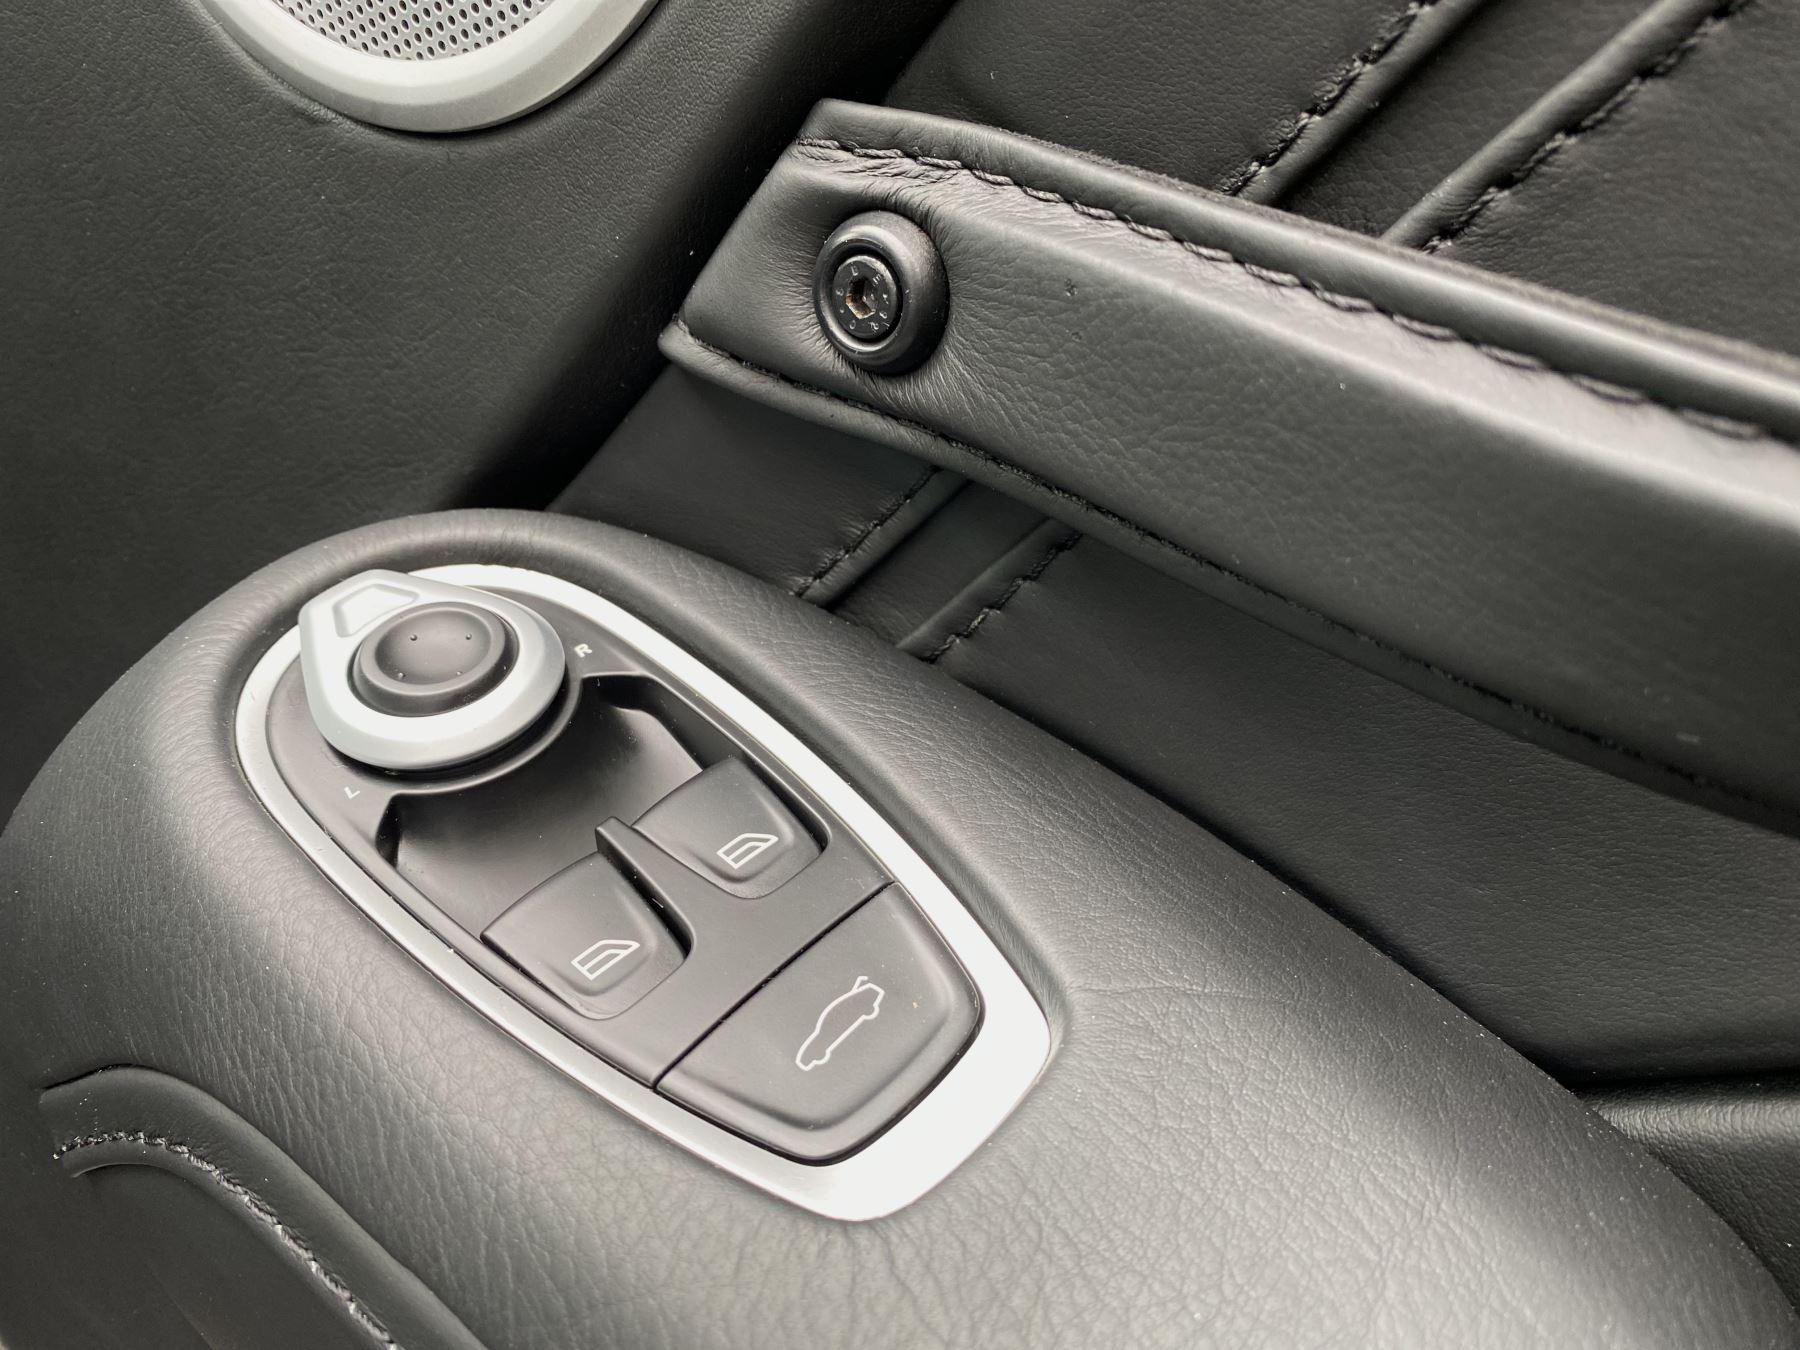 Aston Martin New Vantage 2dr ZF 8 Speed Auto. 4.0 Twin Turbo ZF Gearbox  Reversing Camera Heated Seats Ceramic Brakes image 36